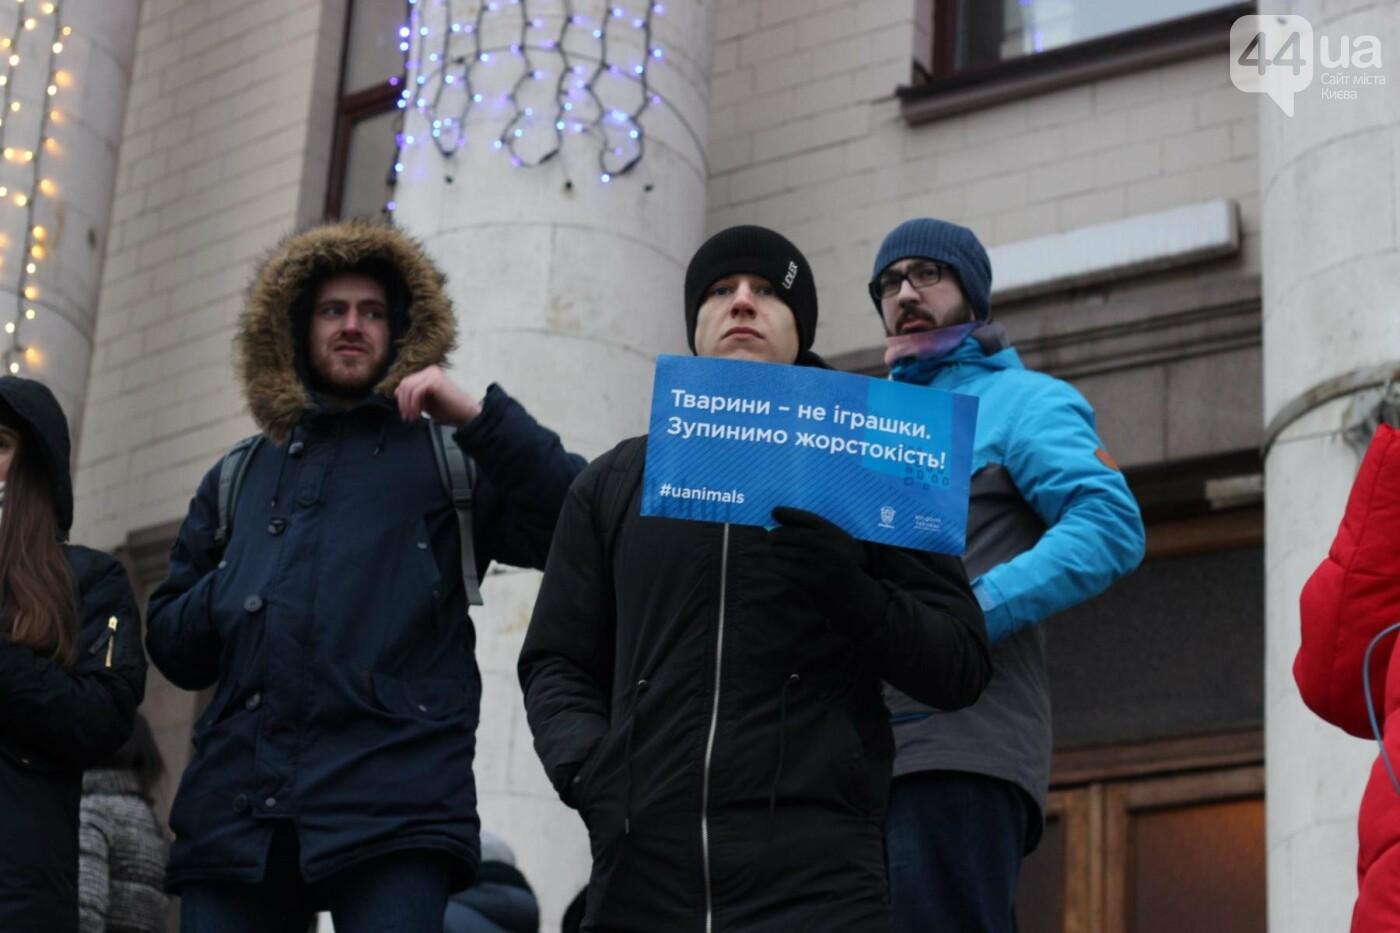 Цирк без животных: как в Киеве прошла акция протеста, фото-18